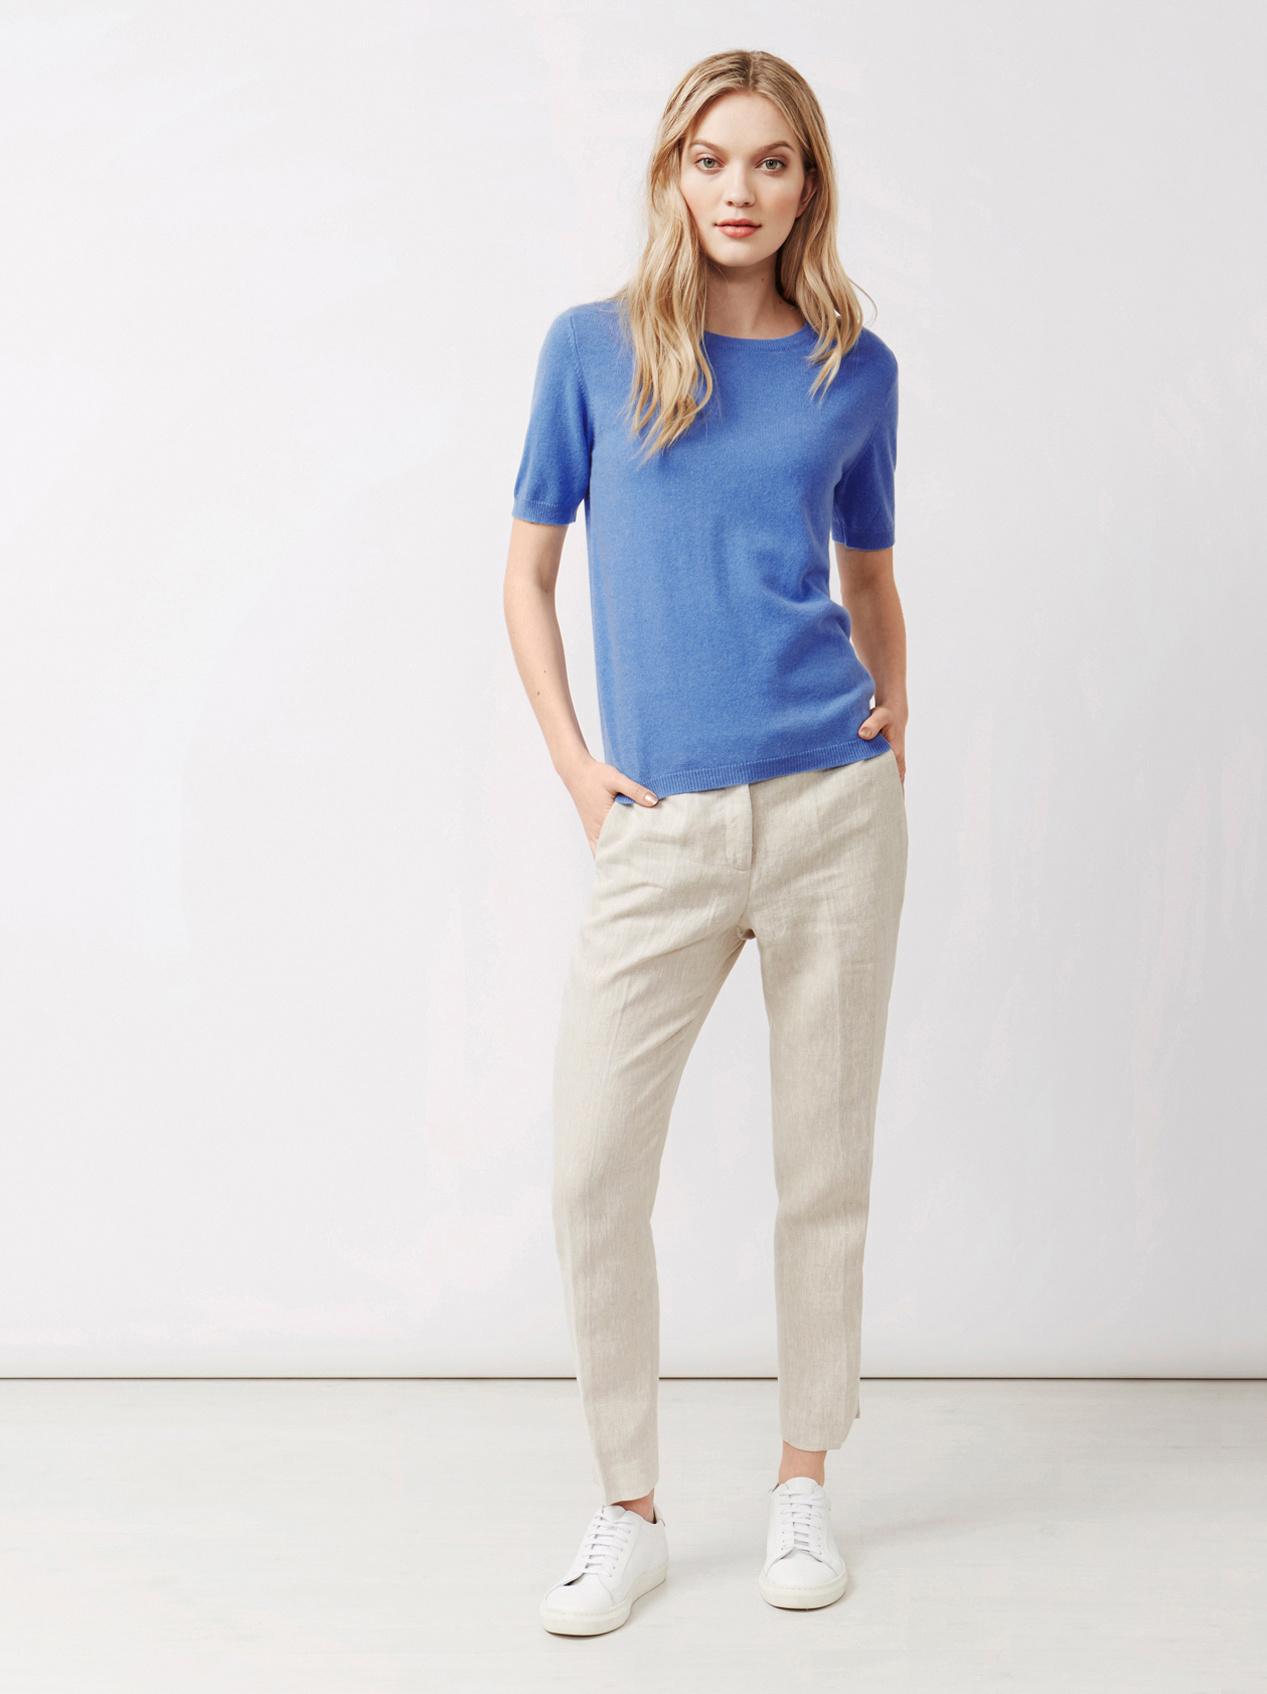 Soft Goat Women's Short Sleeve O-Neck Sky Blue